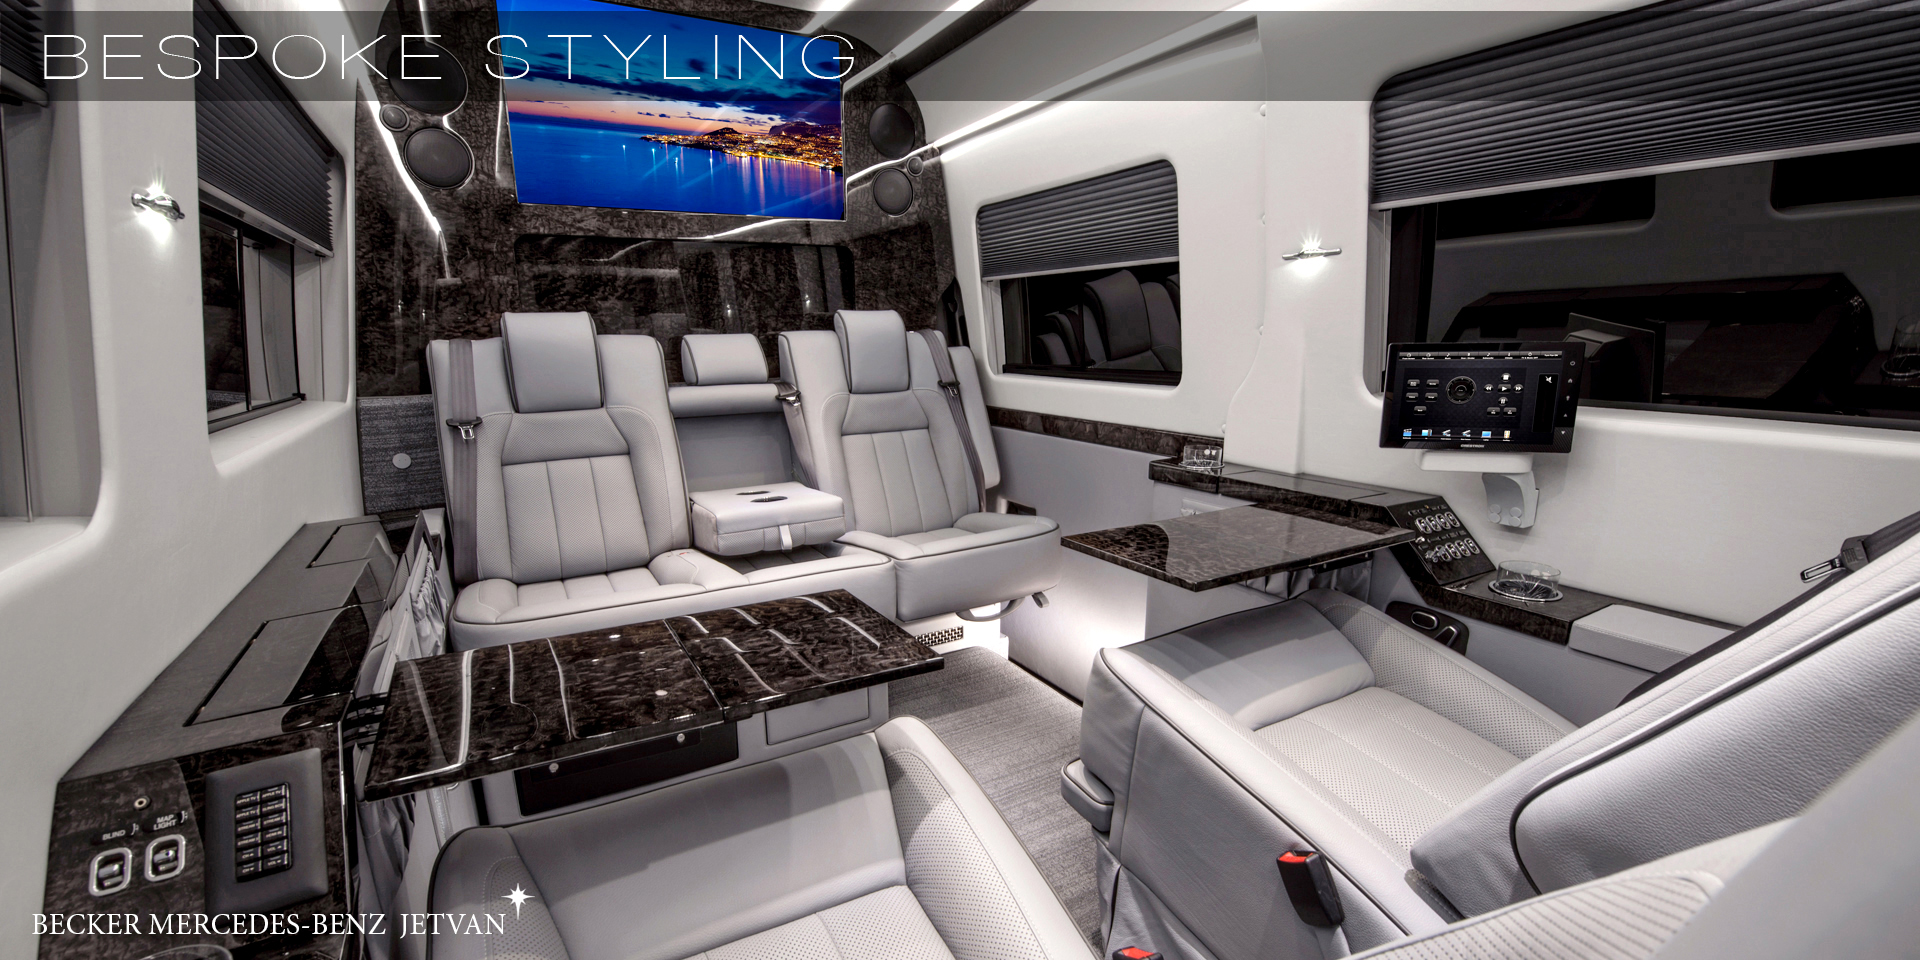 Becker automotive design luxury transport coaches sprinter van and cadillac esv conversions for Cadillac escalade custom interior